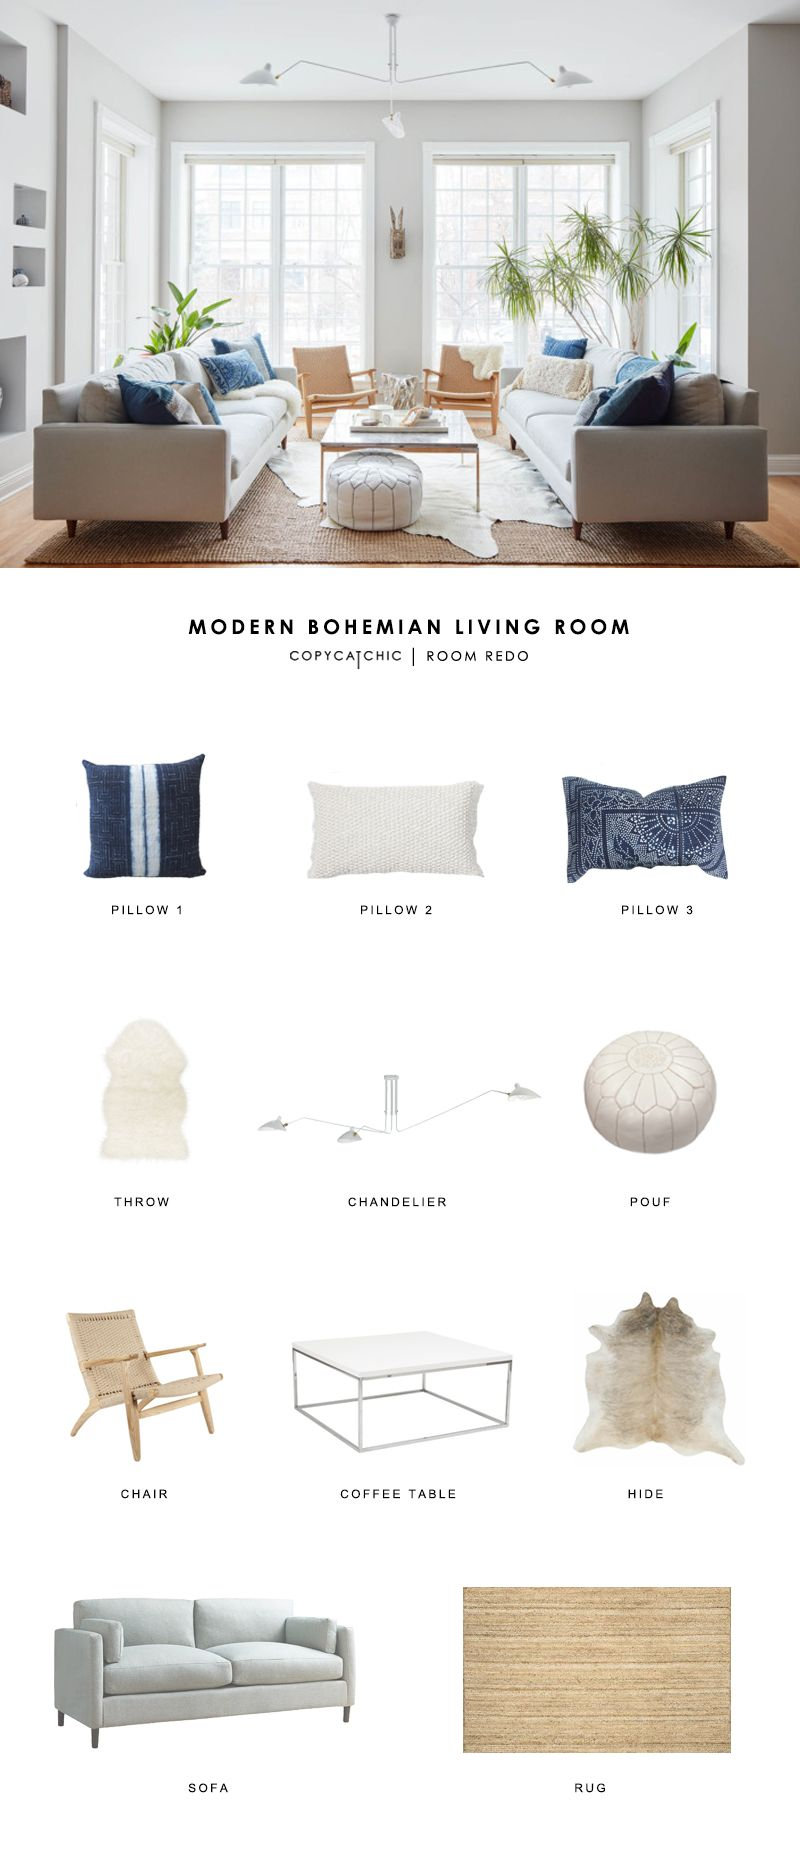 Boho Modern Living Room: Copy Cat Chic Room Redo